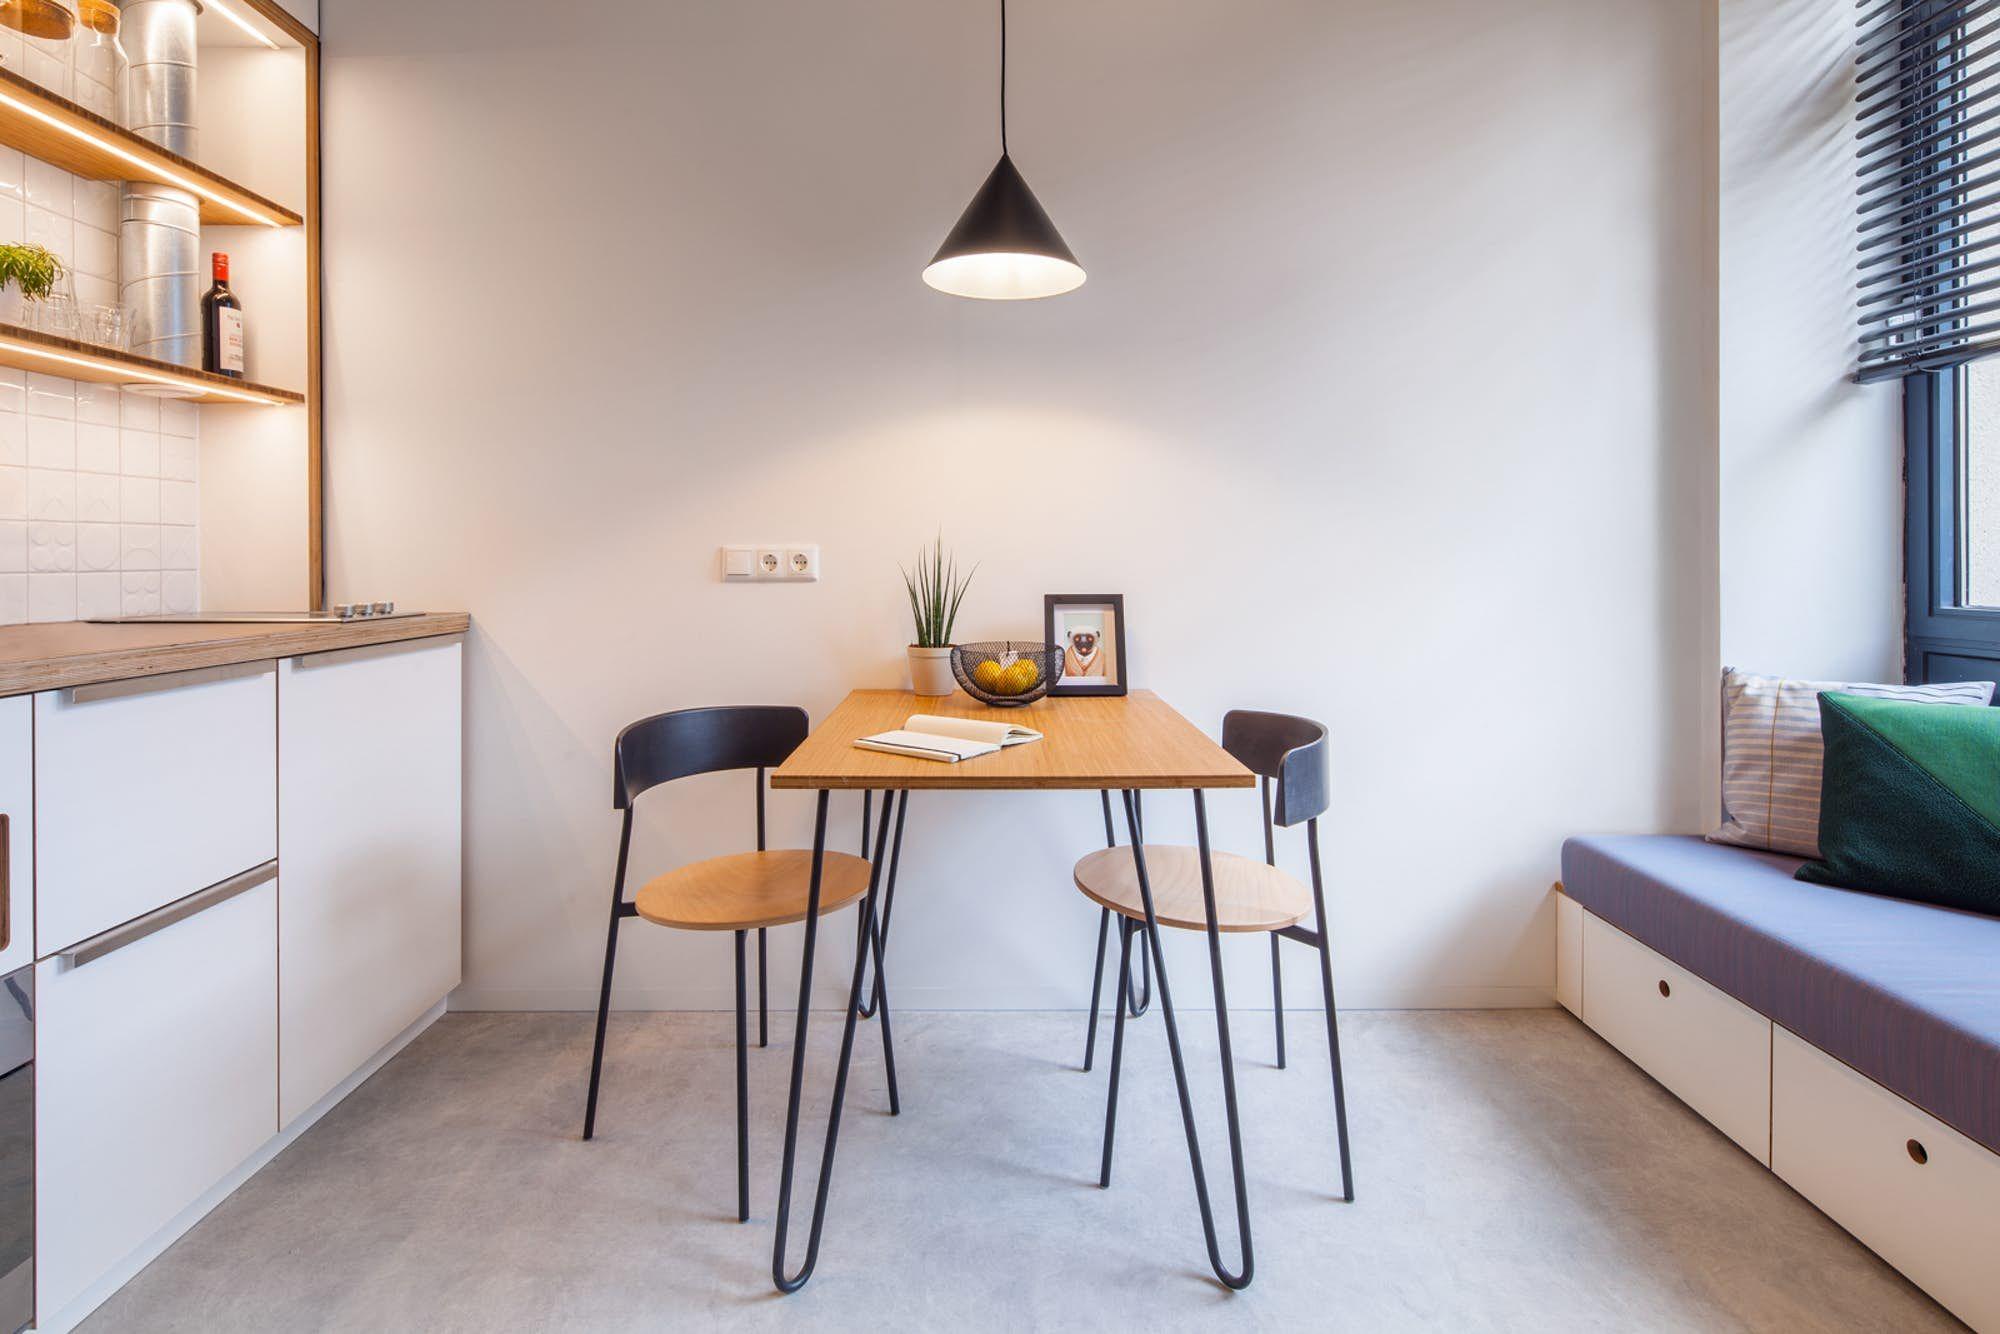 Tiny House Movement Inspires Snug Student Housing Tiny